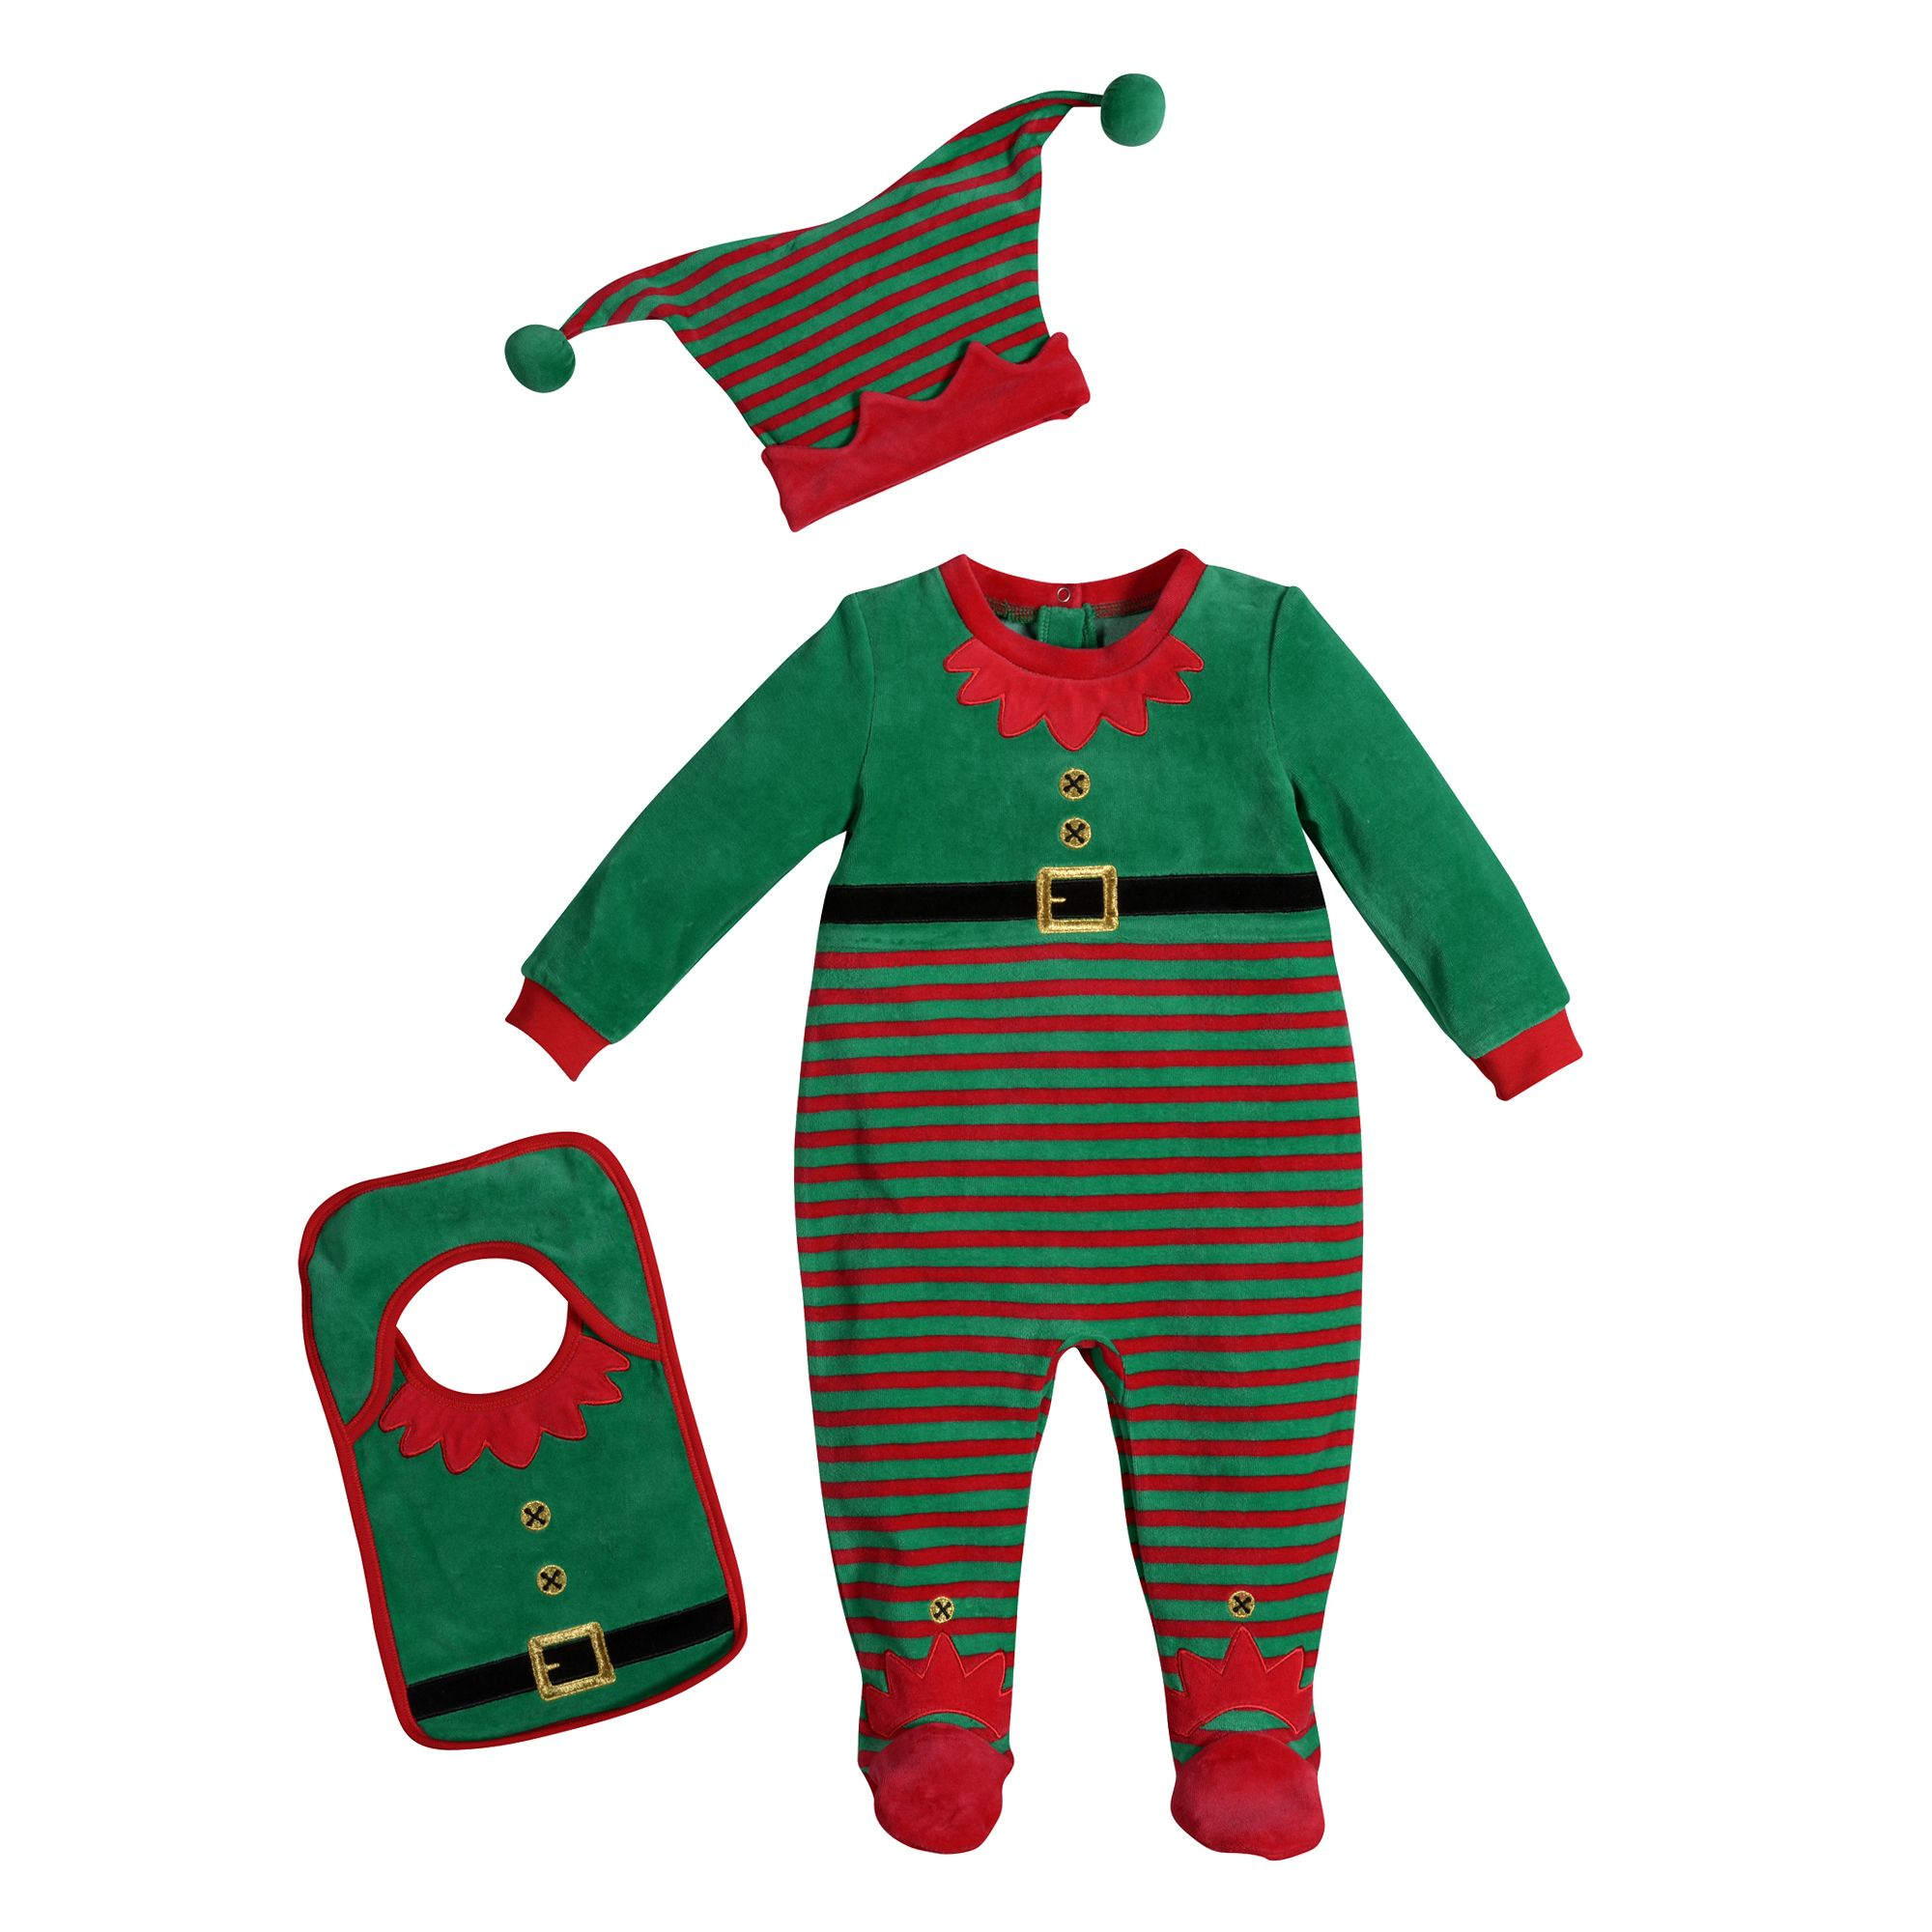 853e1e754e38 offer discounts 3c24f b3b0d new baby s christmas elf sleeper pajamas ...